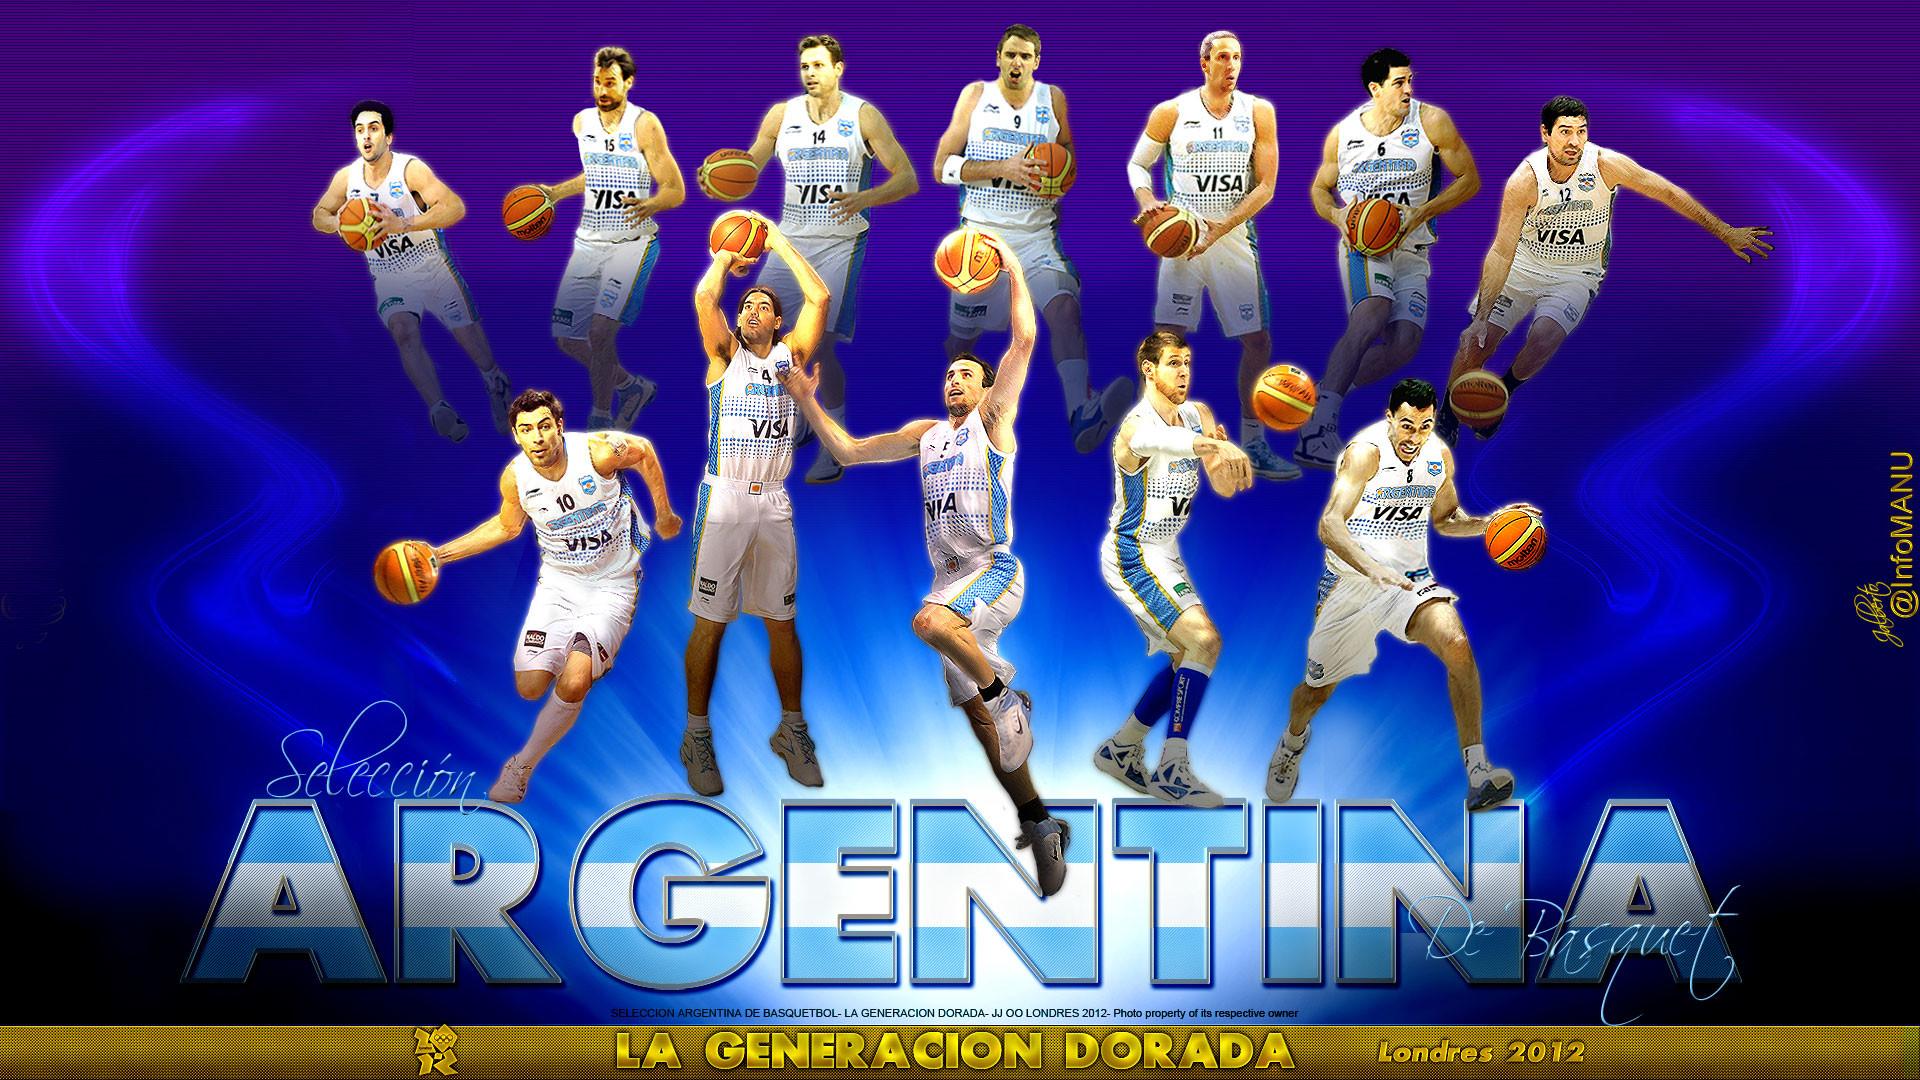 Res: 1920x1080, Argentina Basketball Team London 2012 1920×1080 Wallpaper